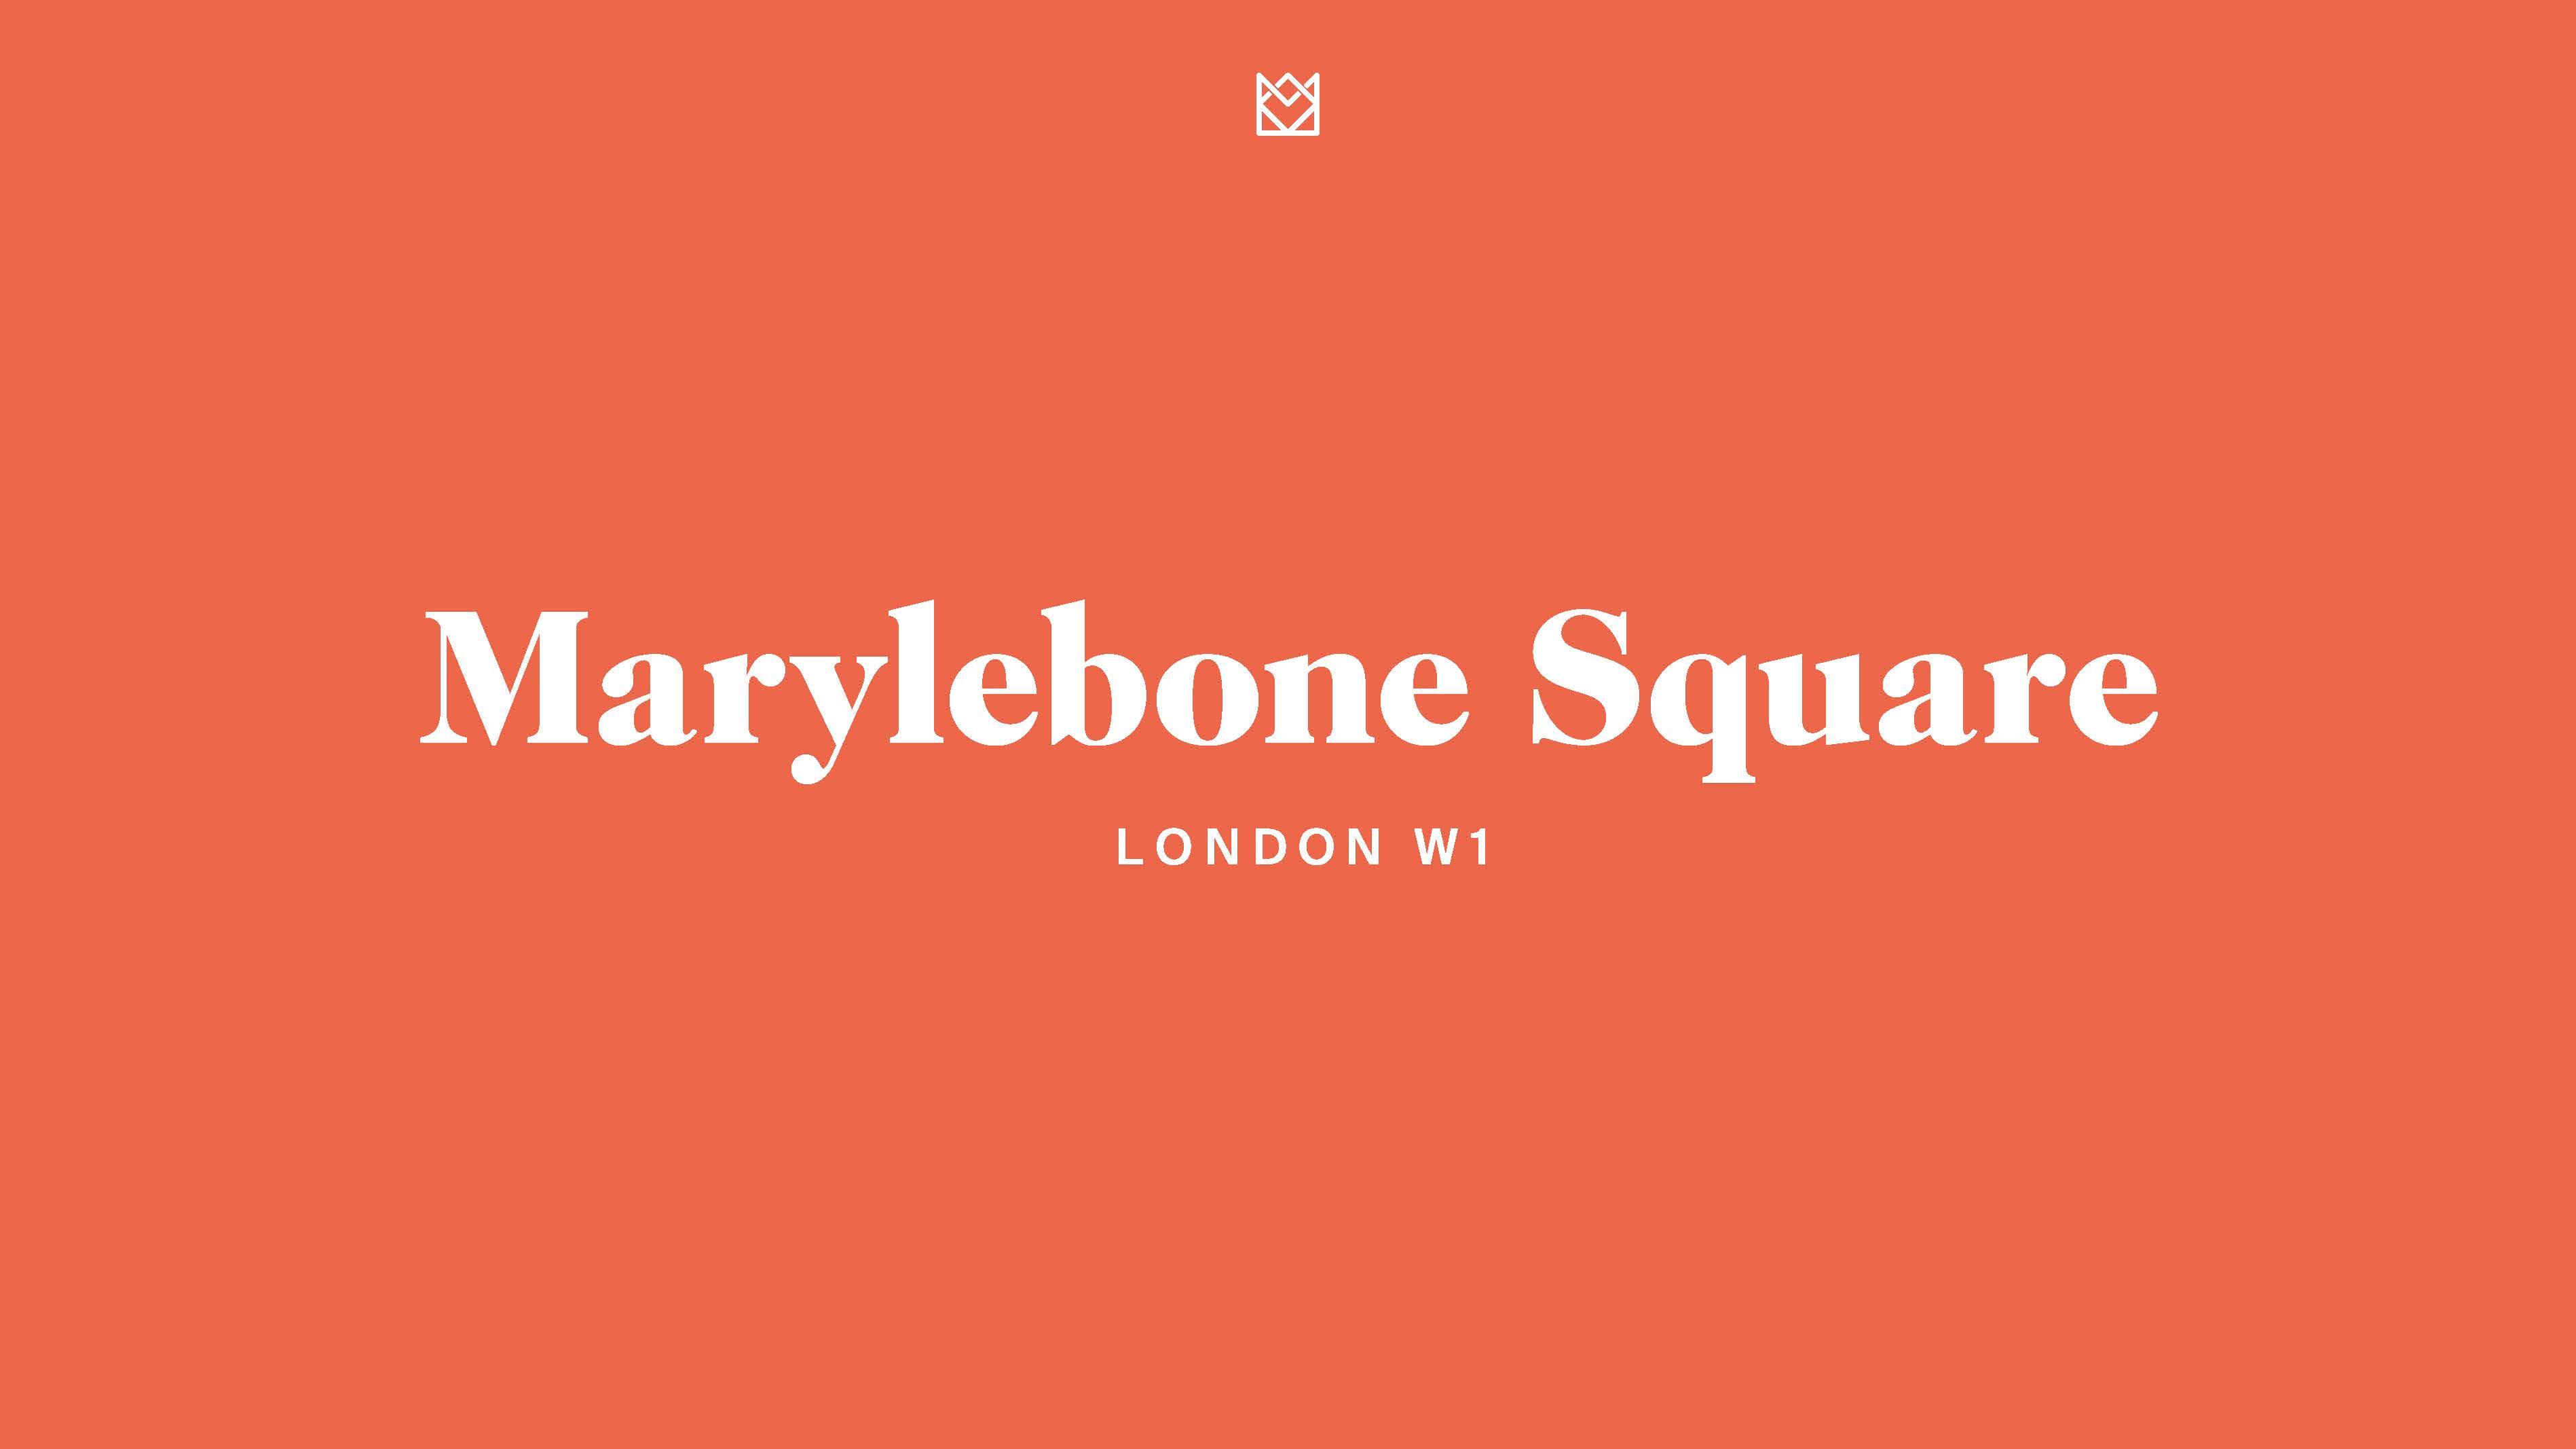 Marylebone Square